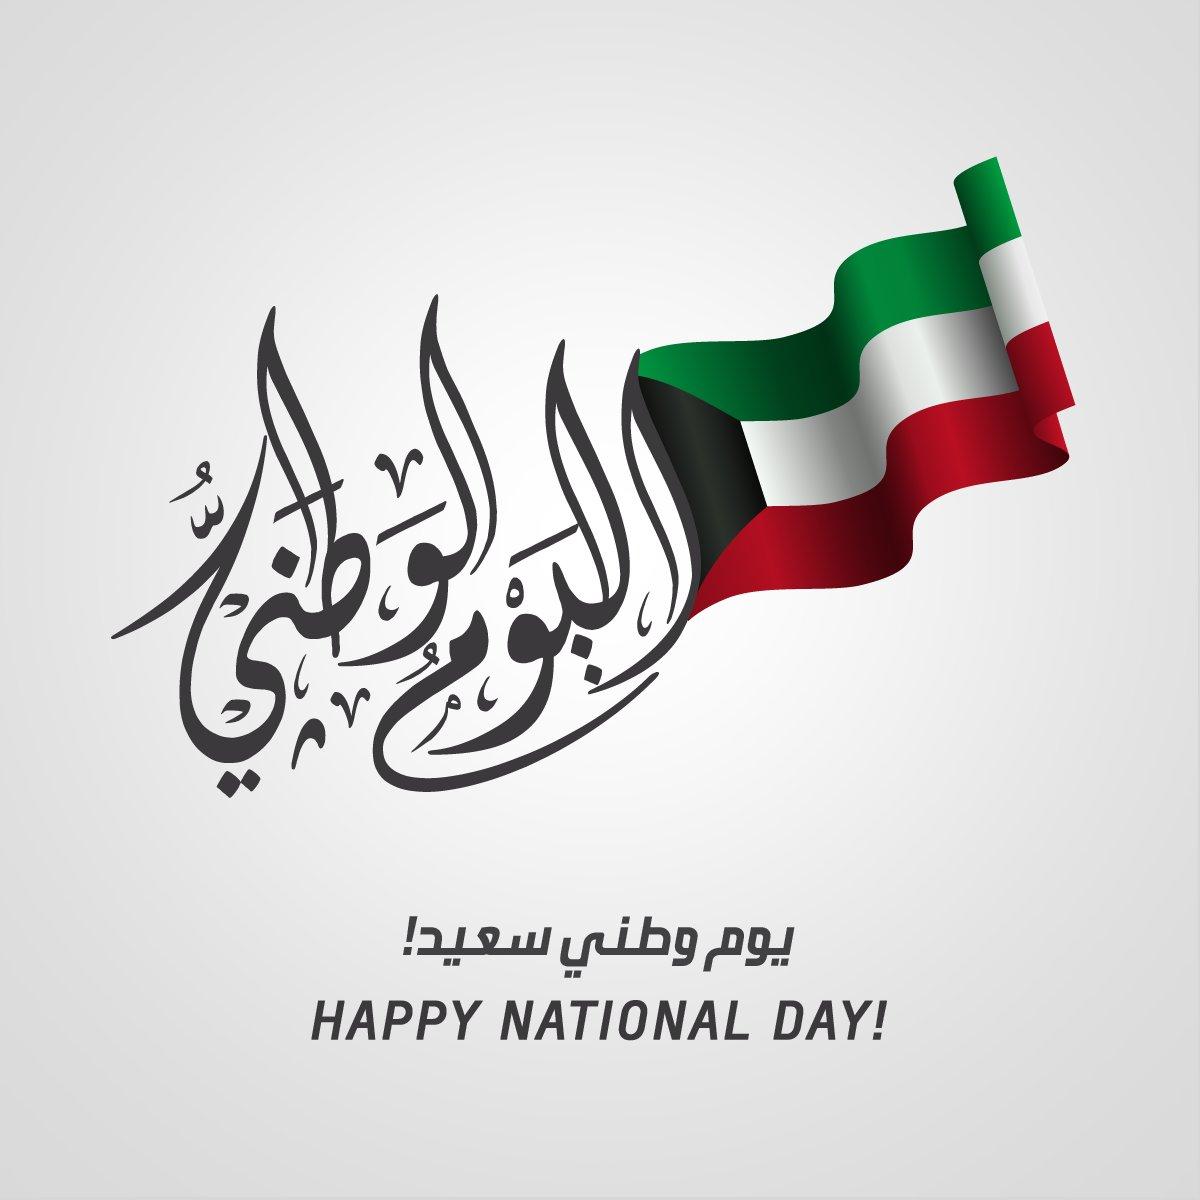 Kuwait Culture LA (@kuwaitculturela) | Twitter